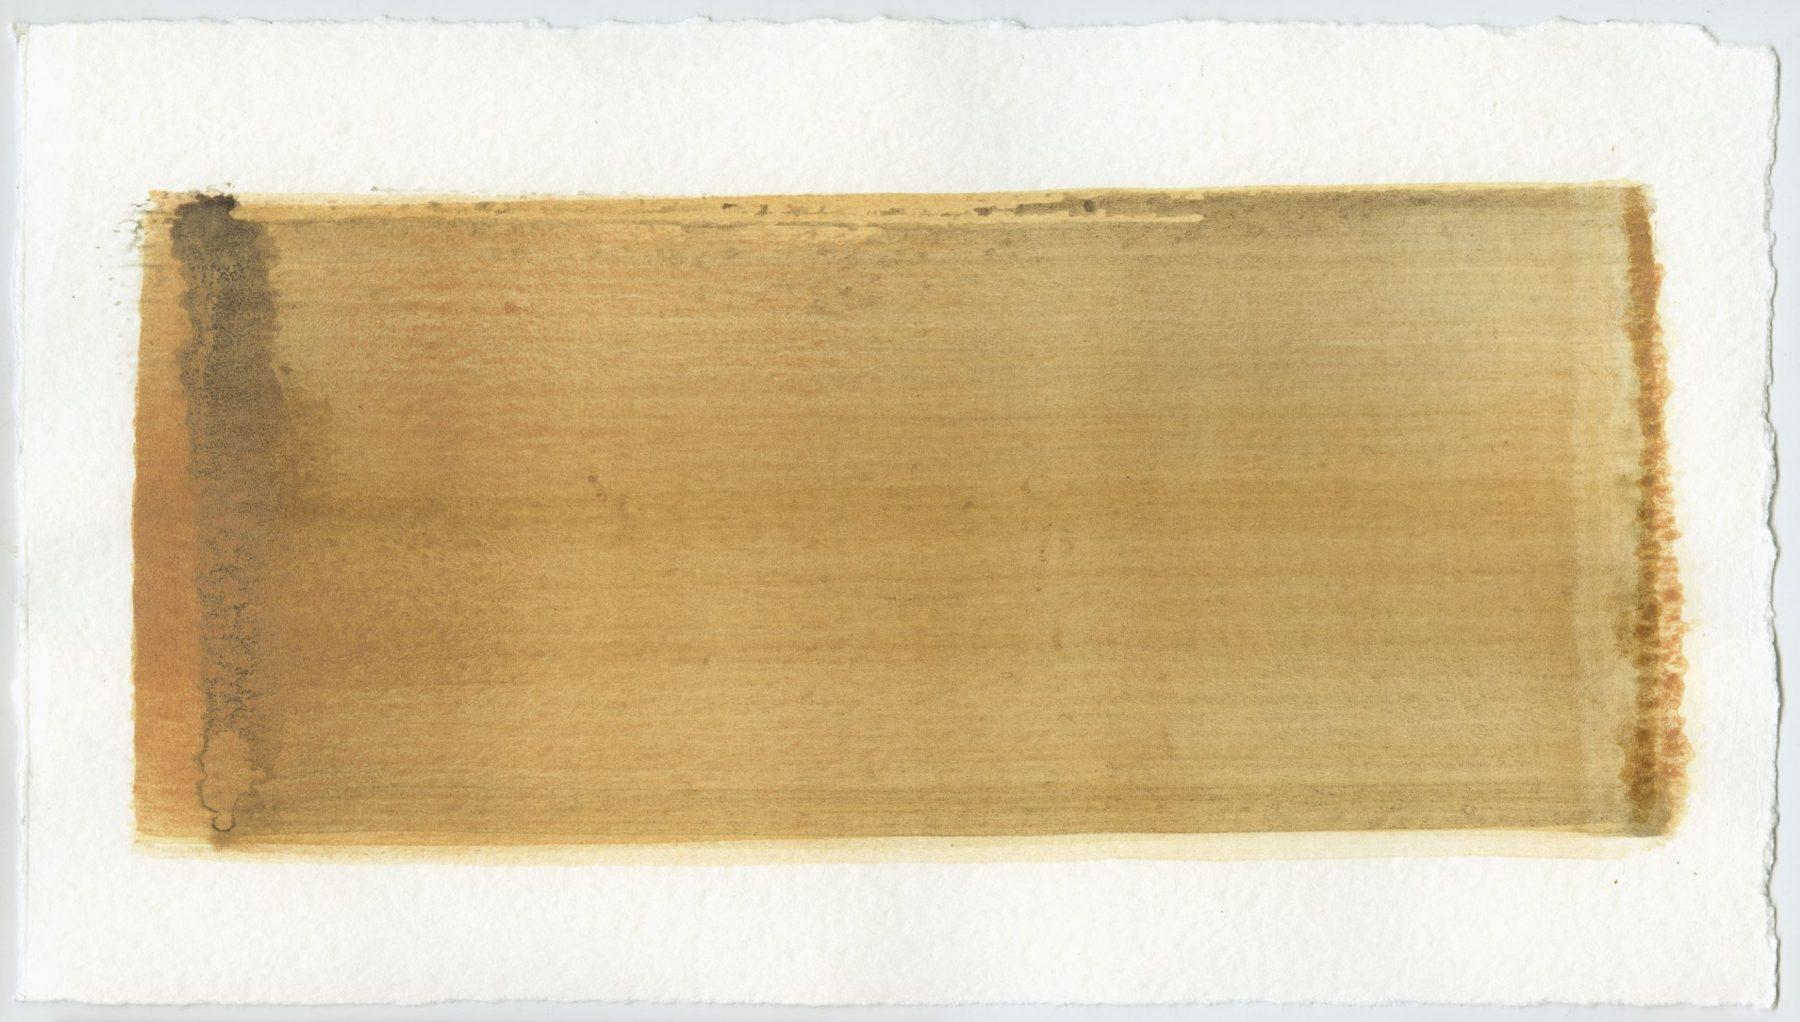 Brush stroke no. 31 - Selfmade pigment: IJzeroer, Slingerpad bruin, Perekker roze